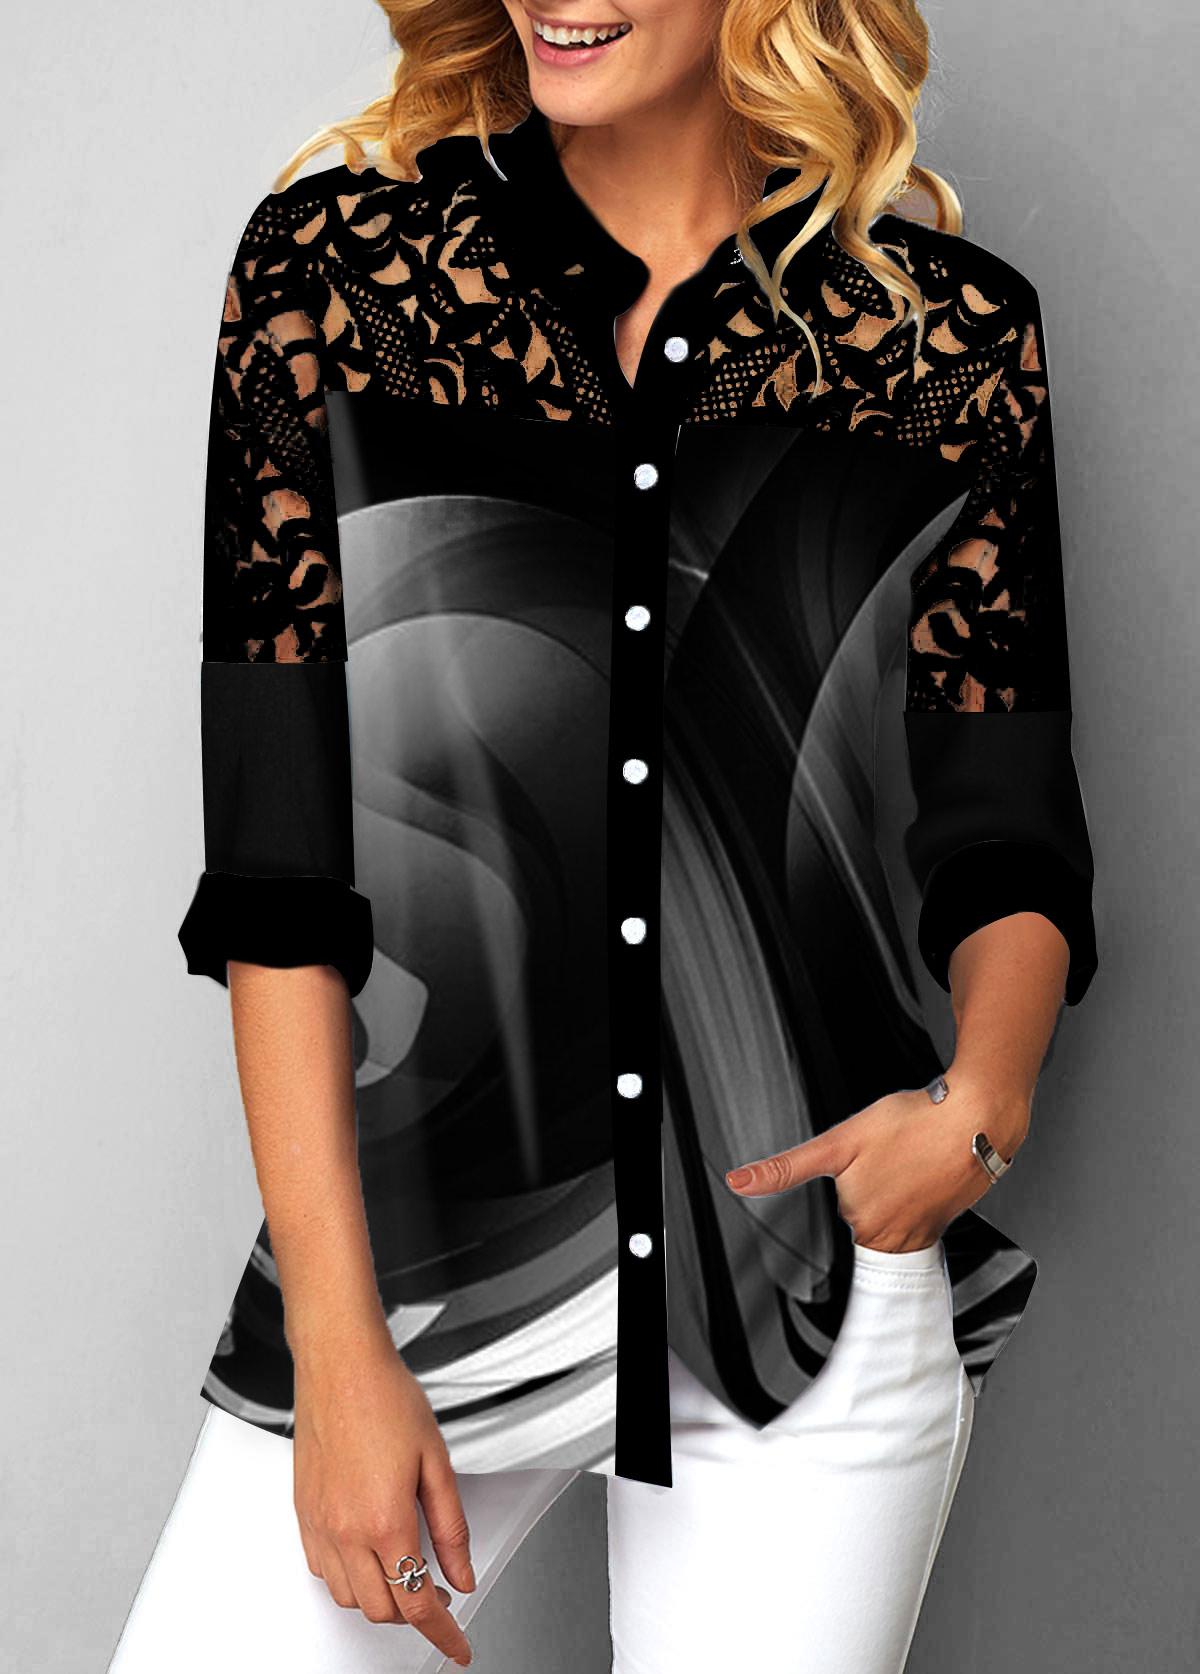 Lace Patchwork Button Detail Turndown Collar Blouse